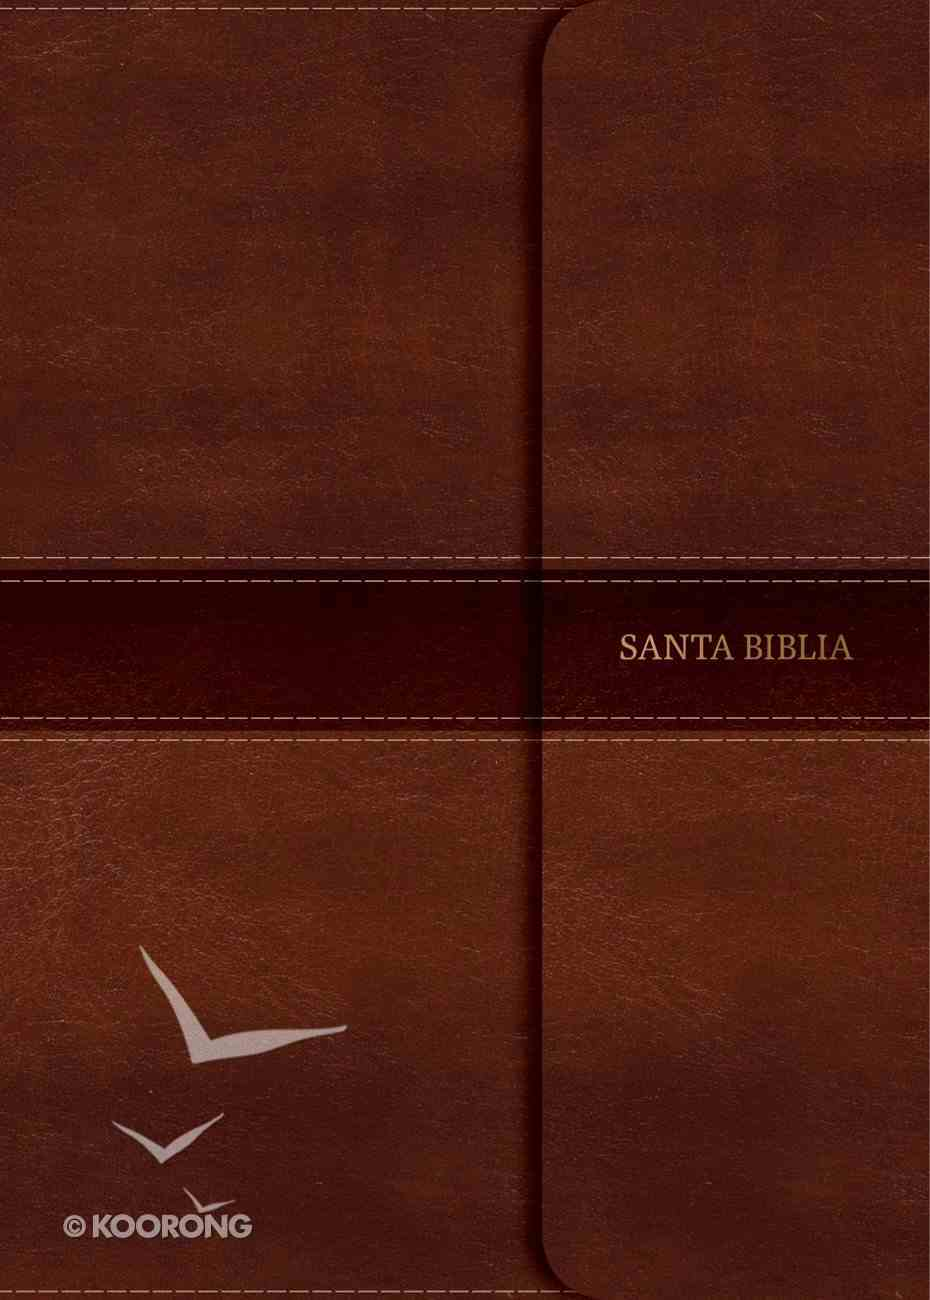 Nvi Biblia Letra Super Gigante Marron Solapa Con Iman (Super Giant Print Magnetic Flap) Imitation Leather